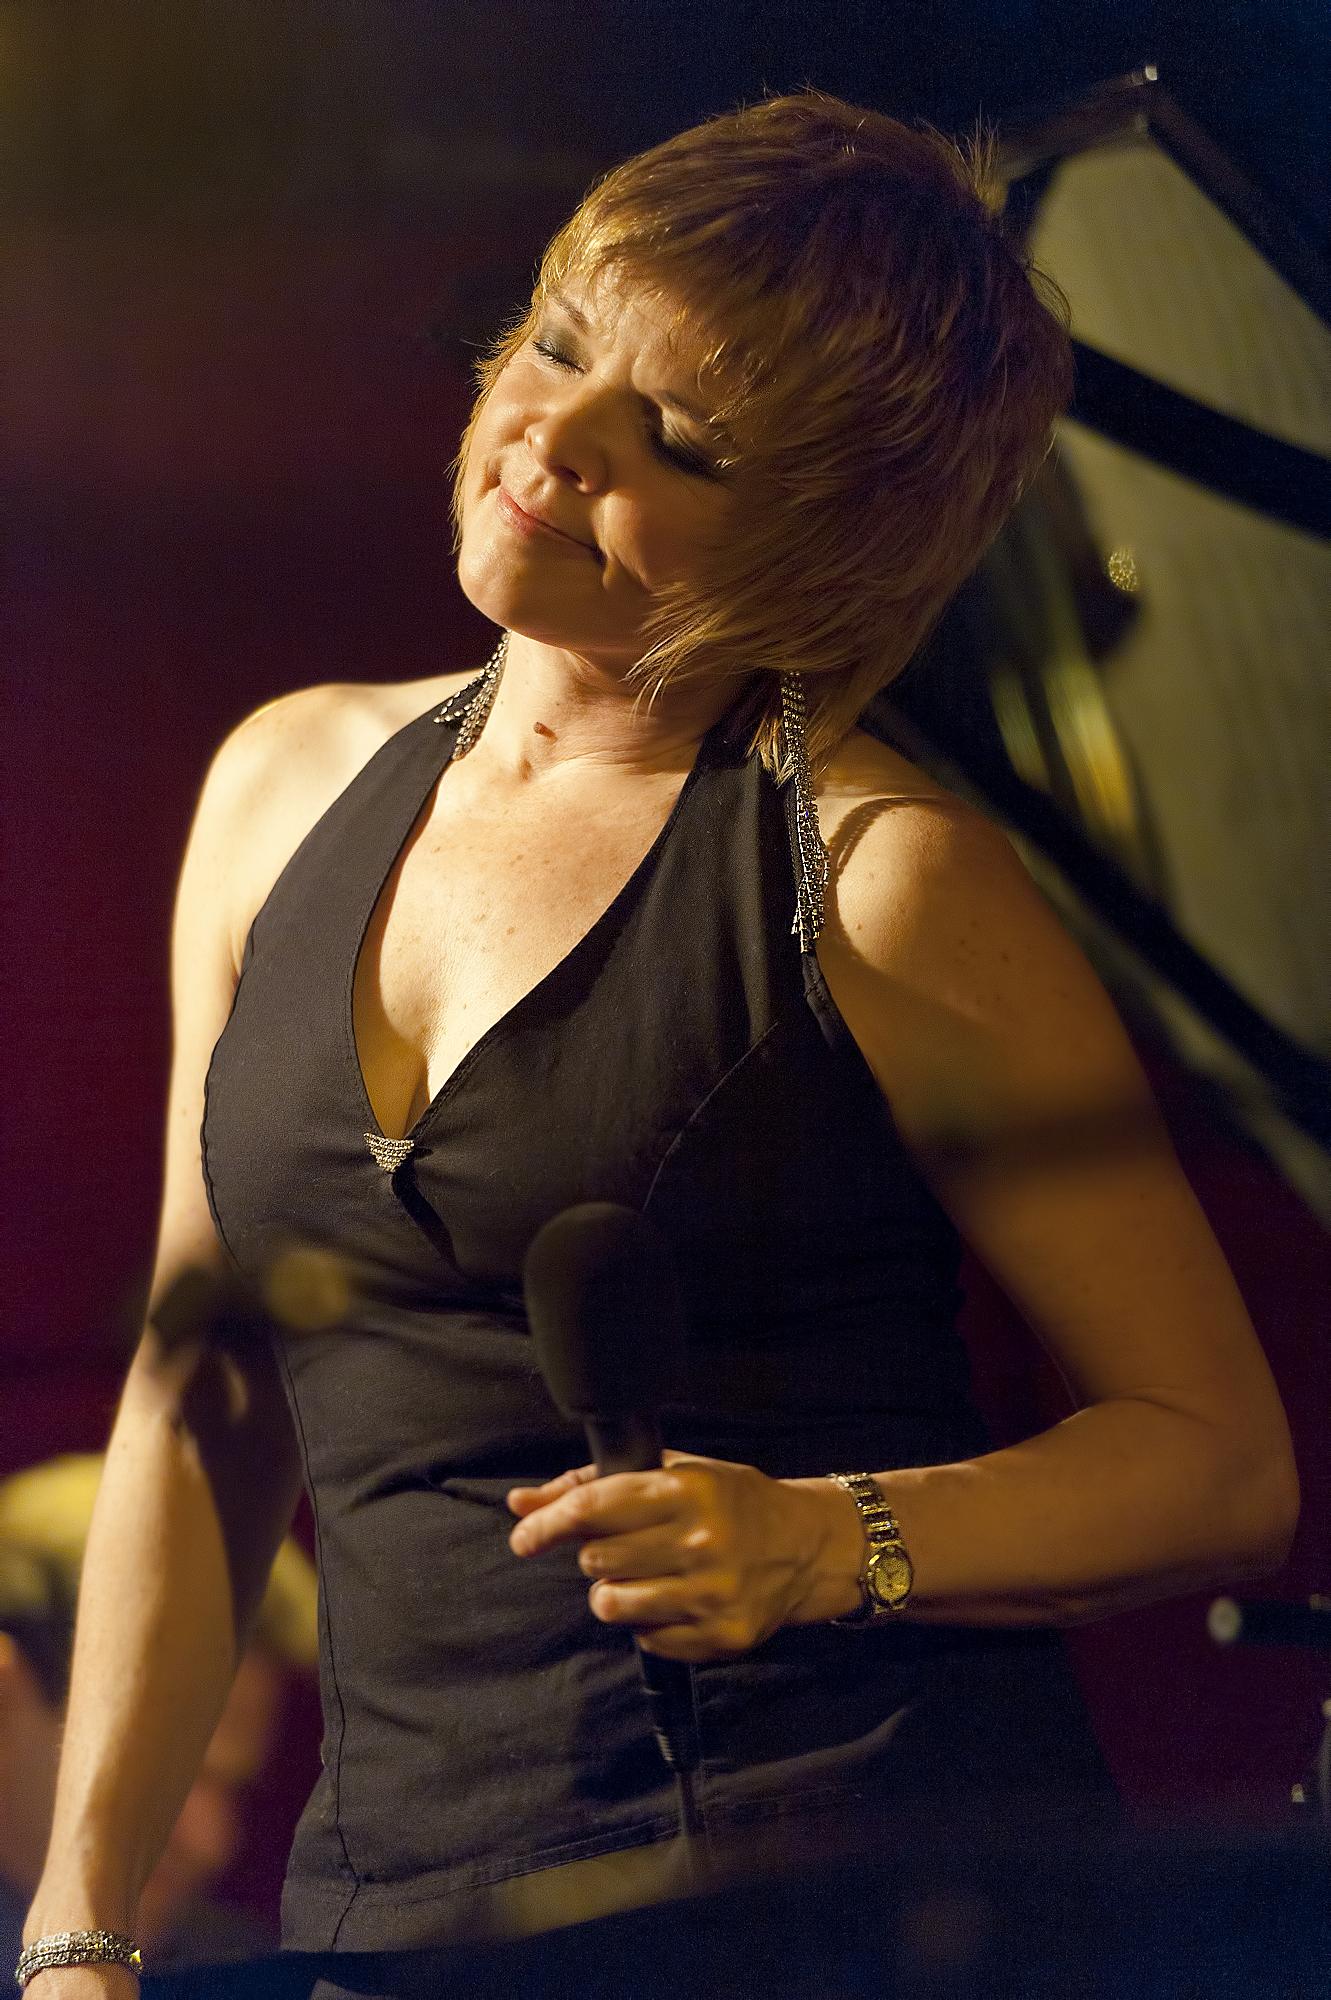 Karrin Allyson at the Jazz Standard Nov 12, 2011